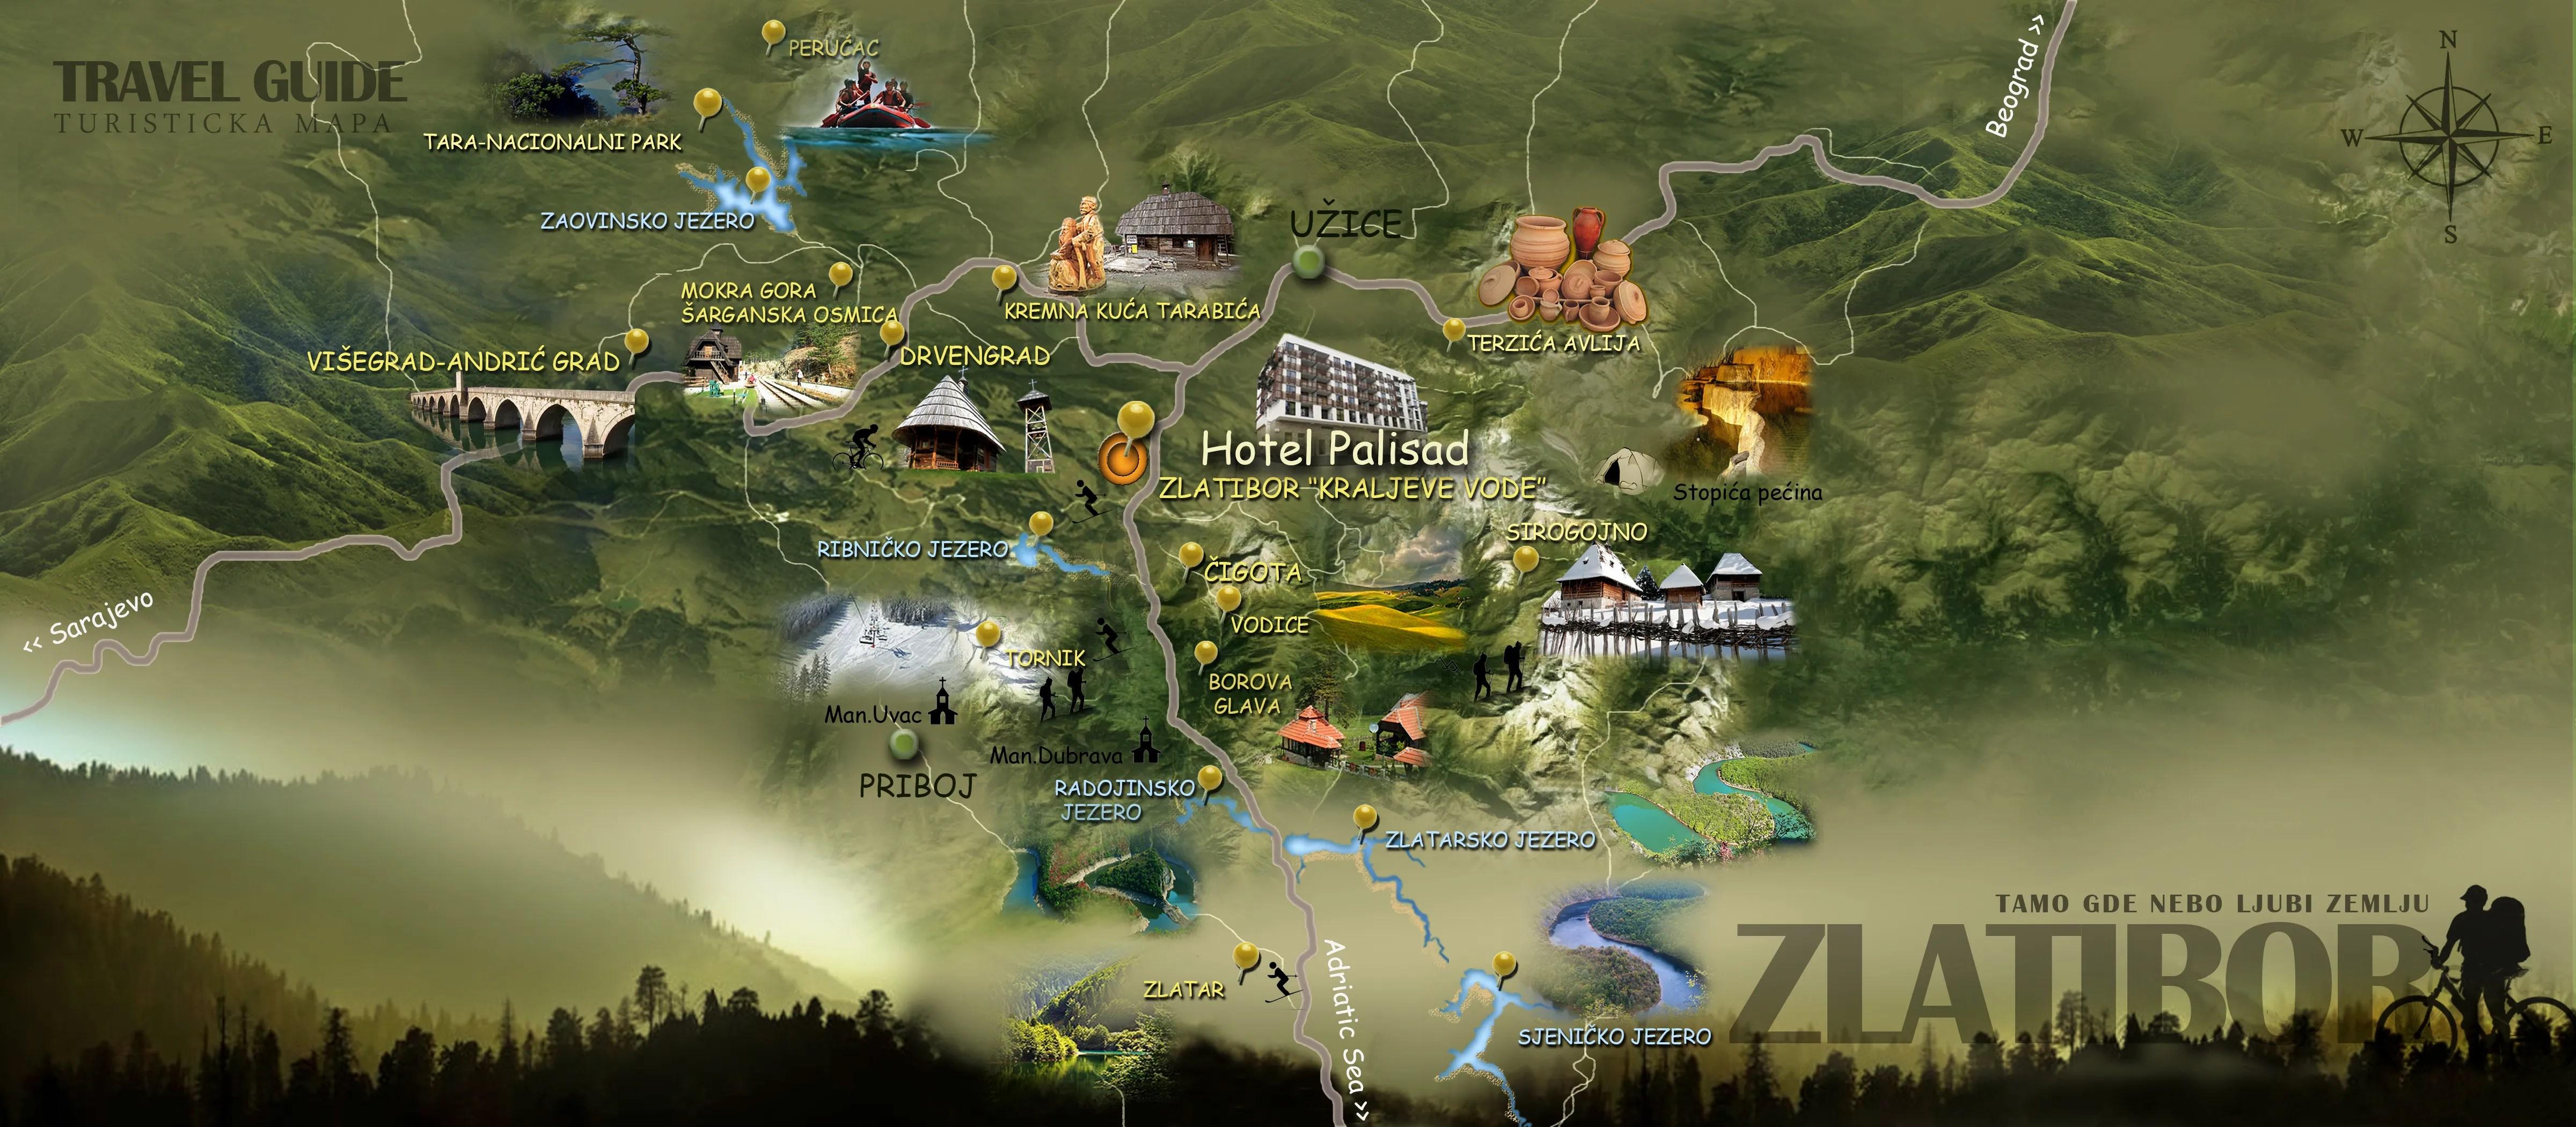 zlatibor mapa zlatibor mapa | Priboj 033 zlatibor mapa